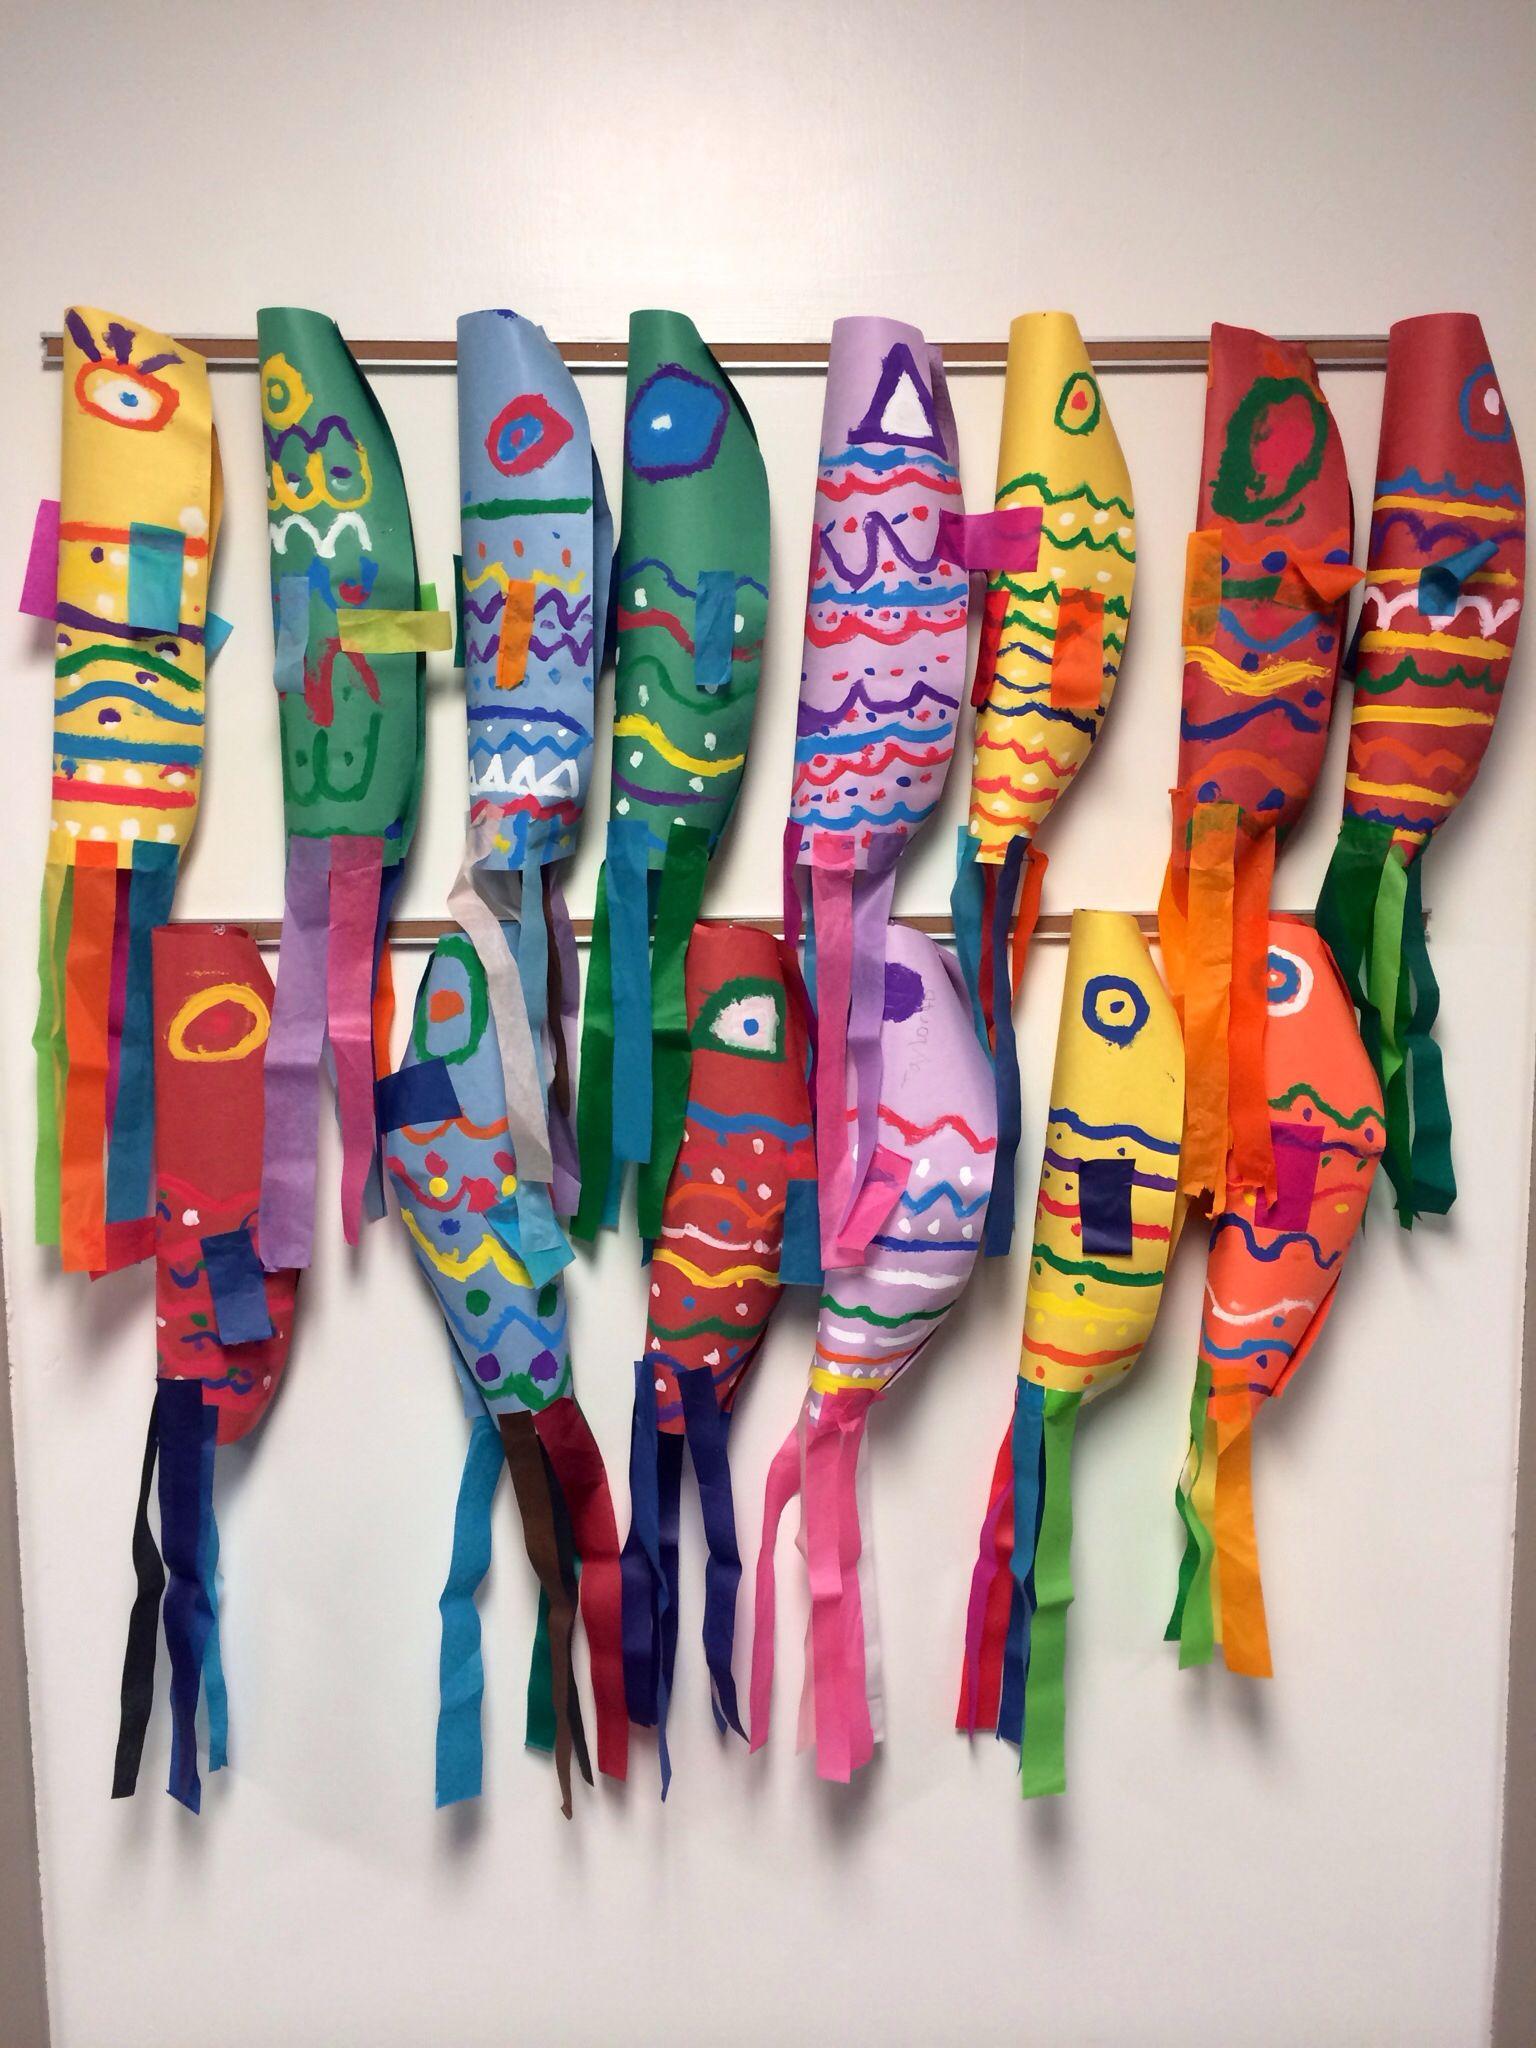 Elementary Art Project Japanese Koinobori Culture Carp